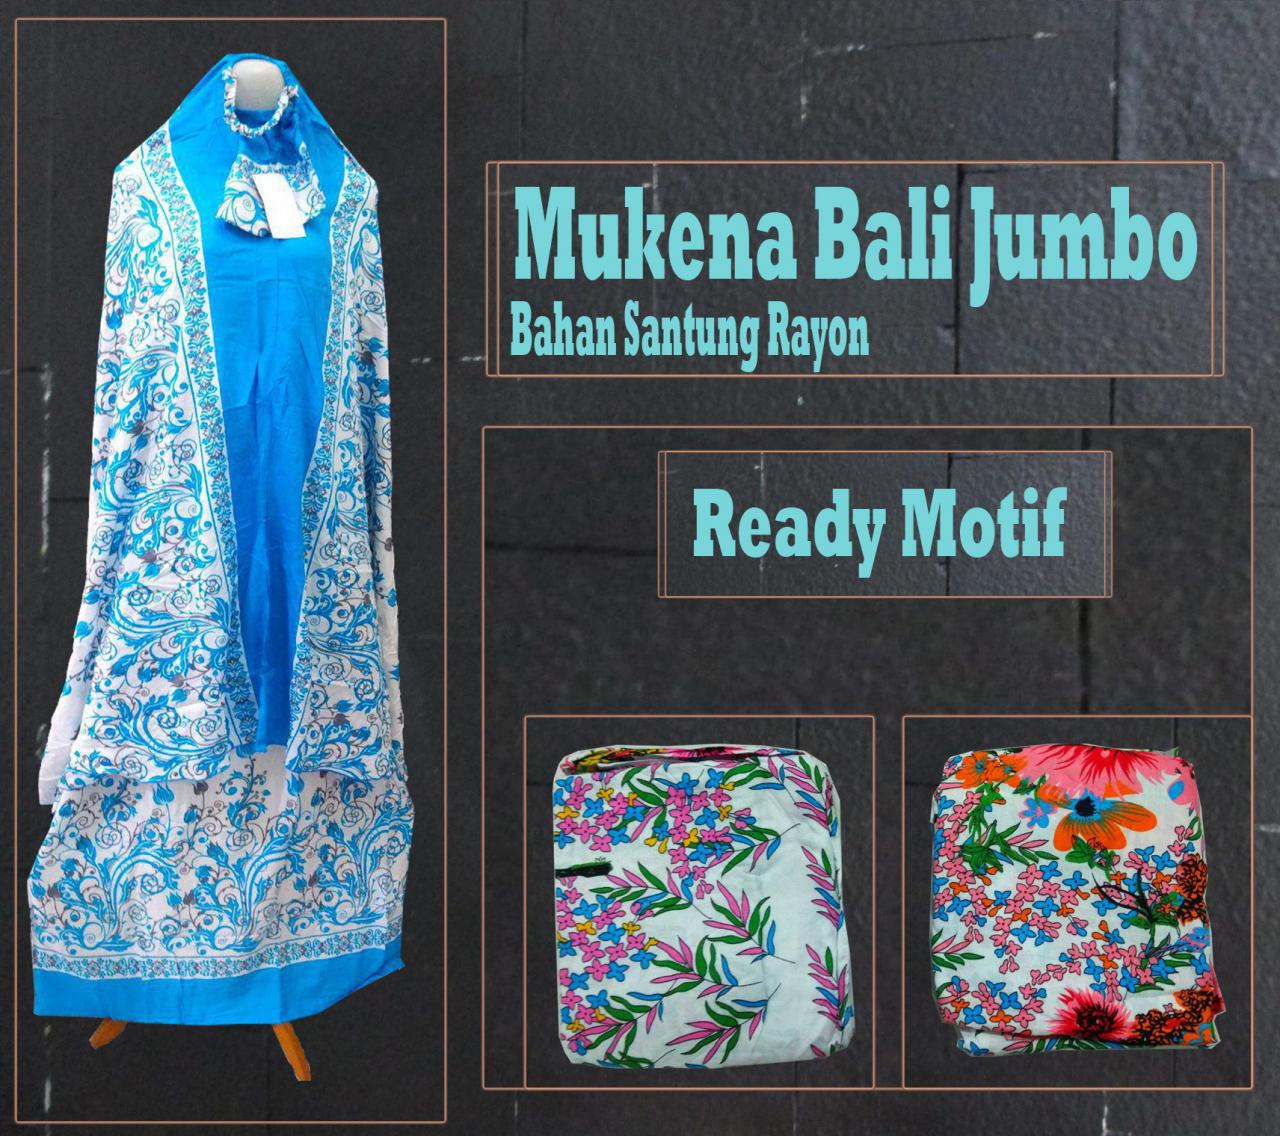 Pusat Grosir Baju Murah Solo Klewer 2019 Produsen Mukena Bali Jumbo Murah 67ribuan